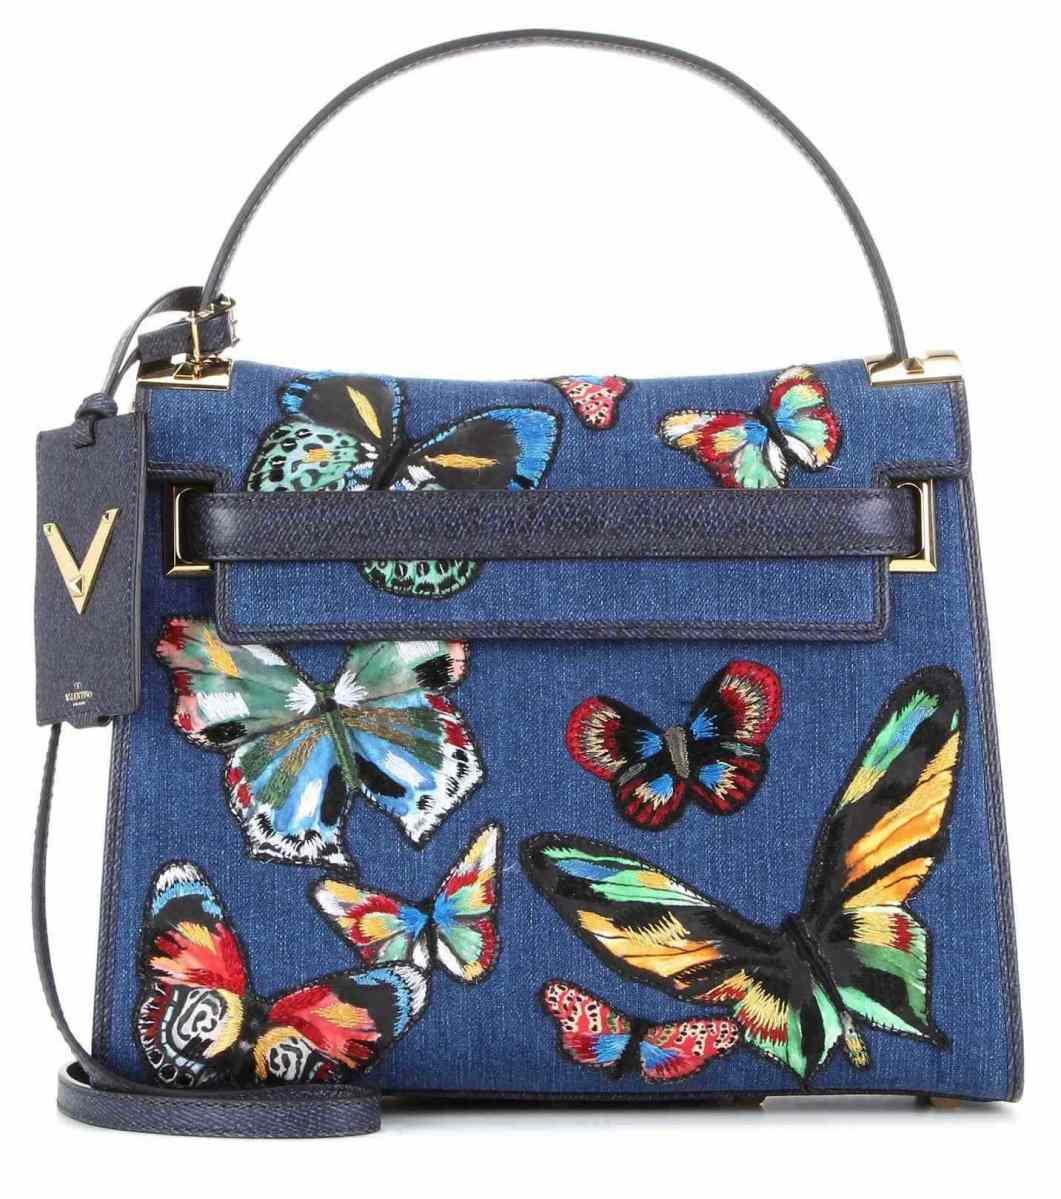 7 Designer Denim Bags You Need For Summer